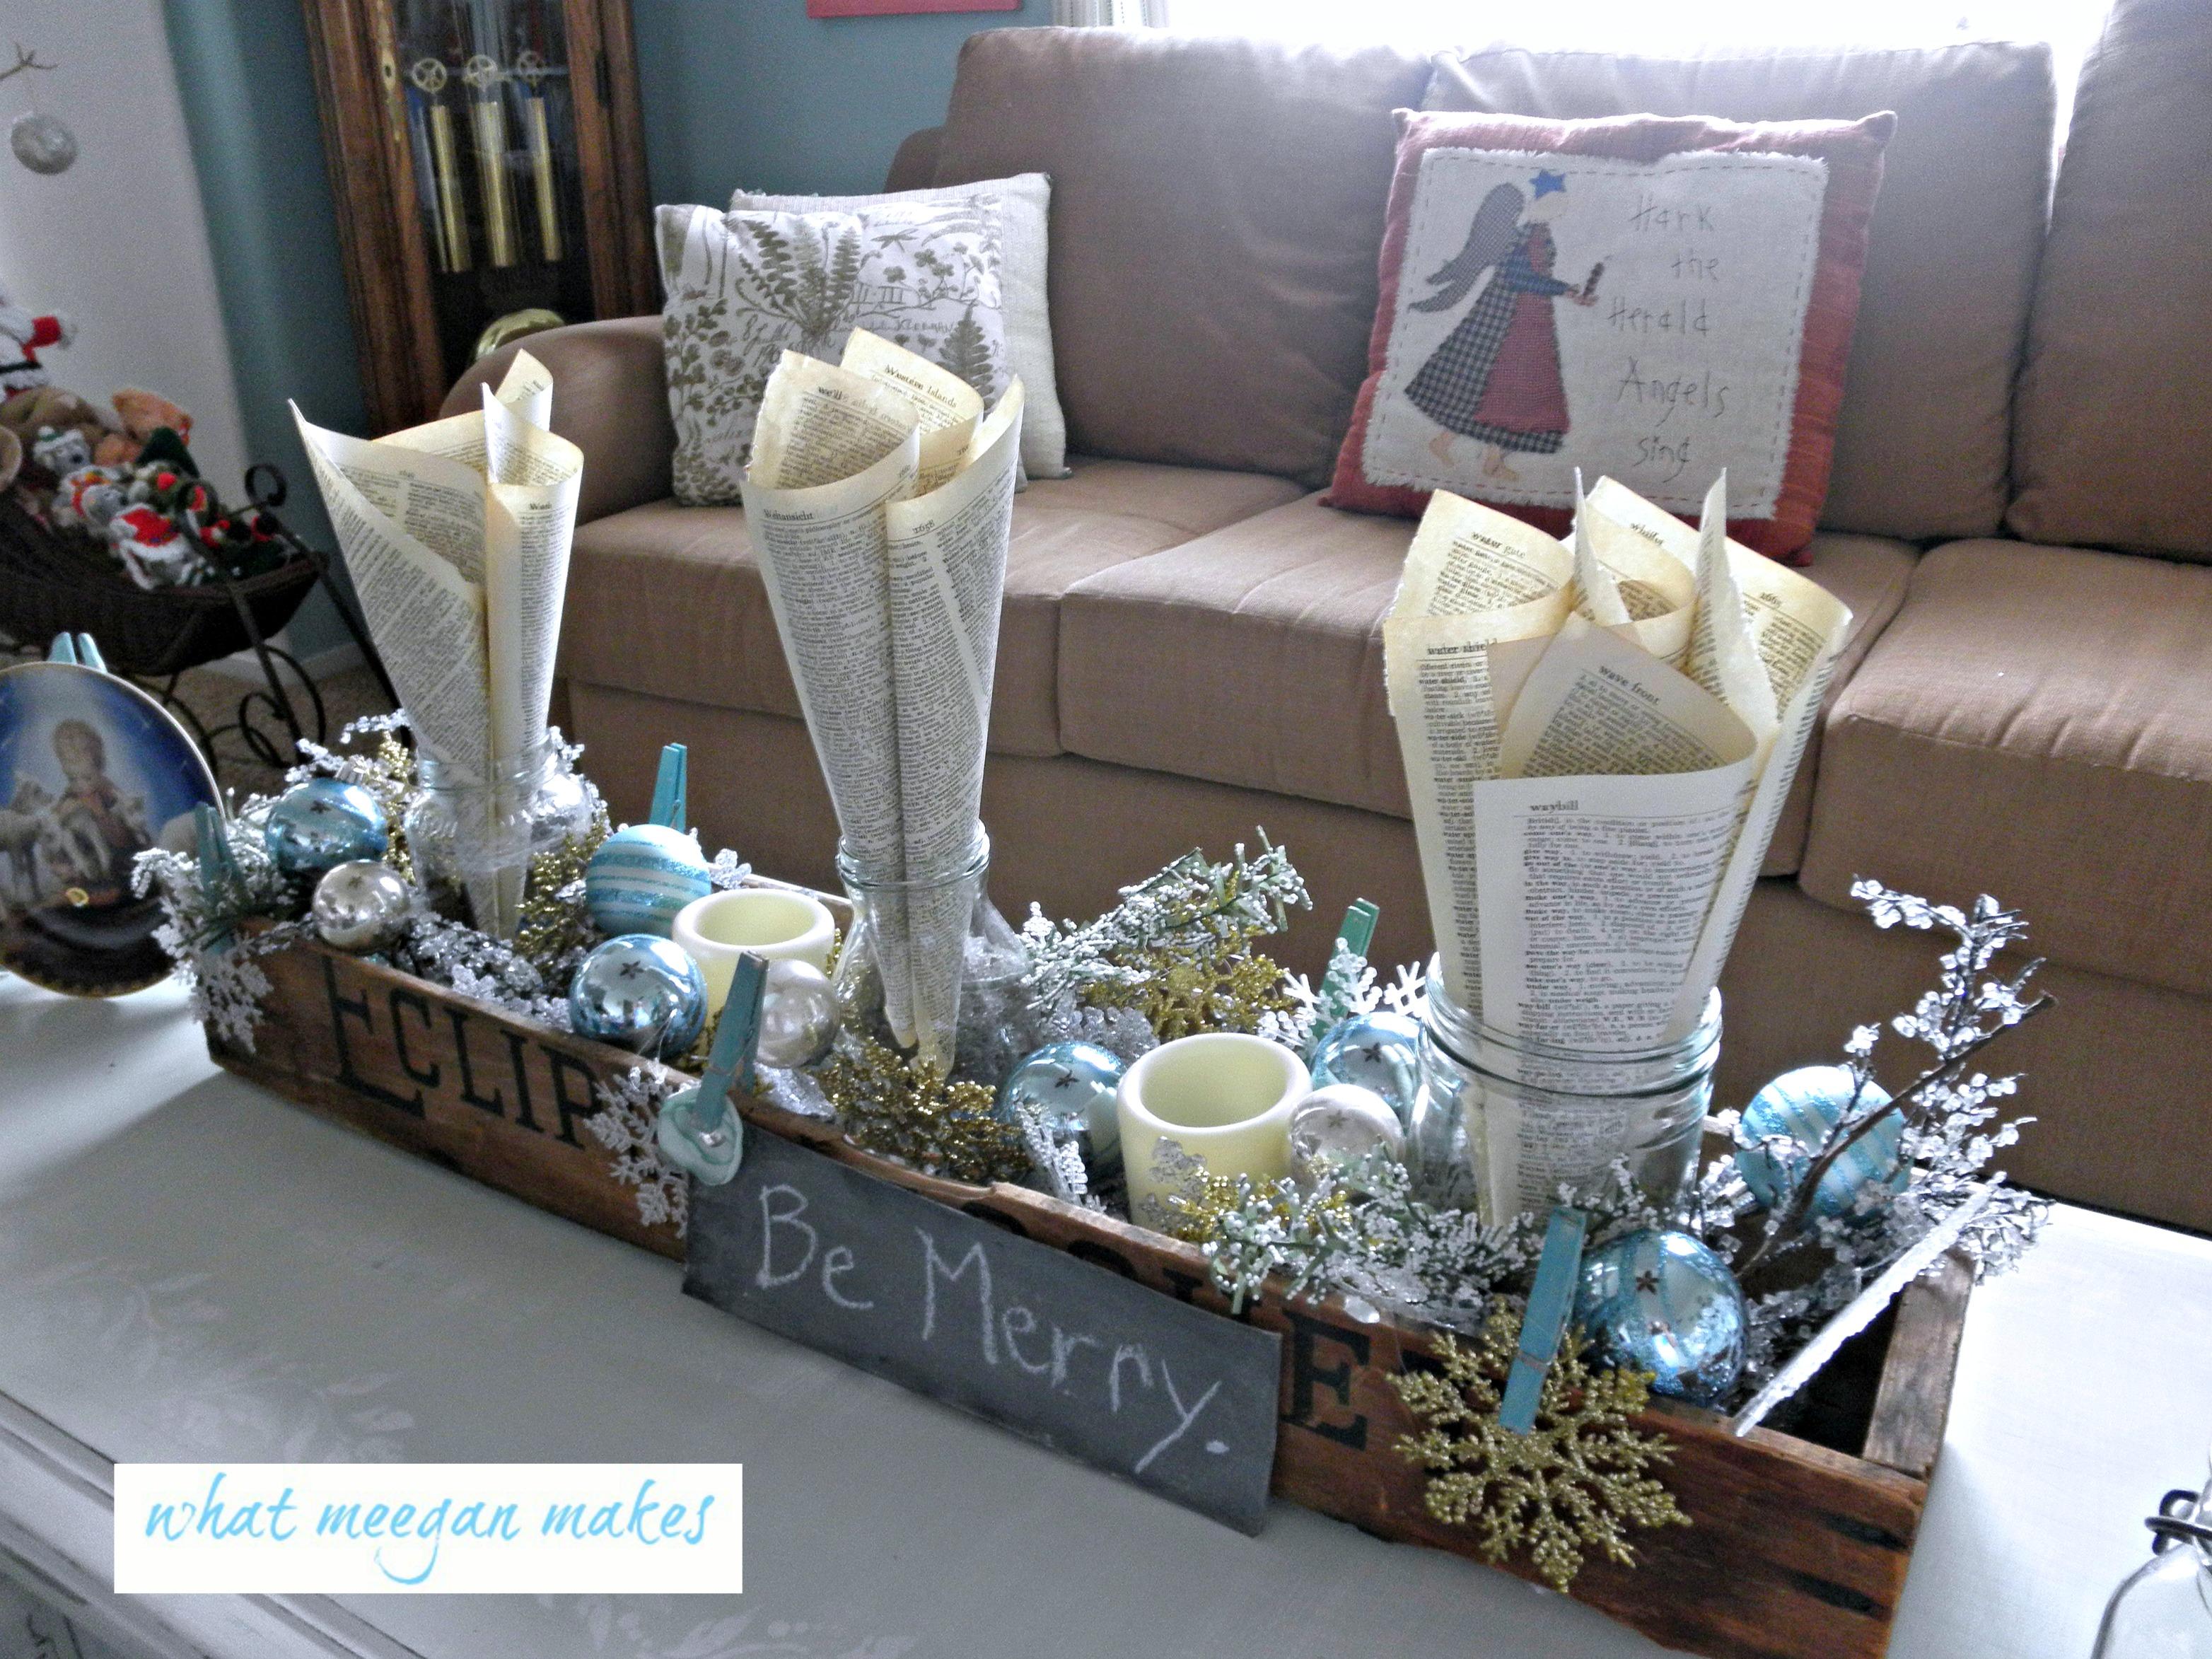 Meegan39s christmas decor tour for Coffee table centerpiece ideas for christmas